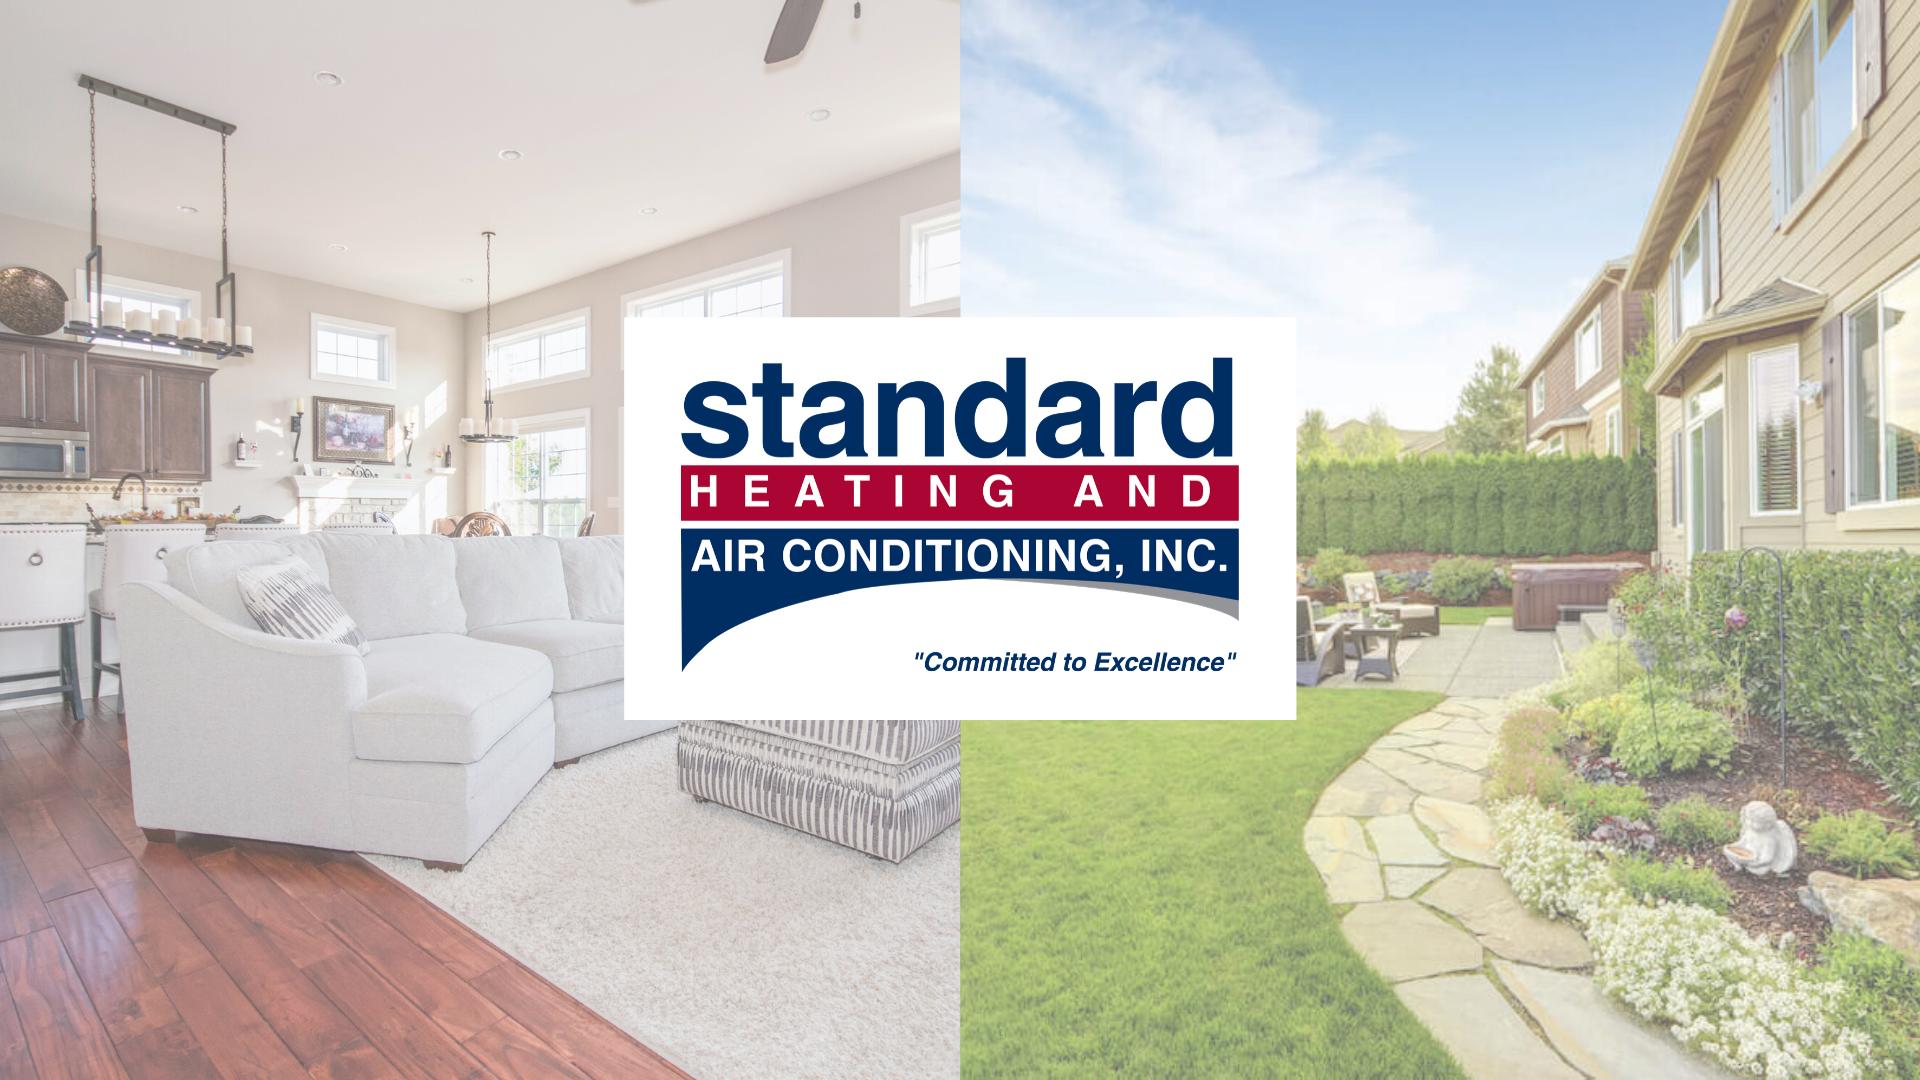 Standard Heating & Air Conditioning, Inc. reviews | Heating & Air Conditioning/HVAC at 11746 Portal Road - La Vista NE